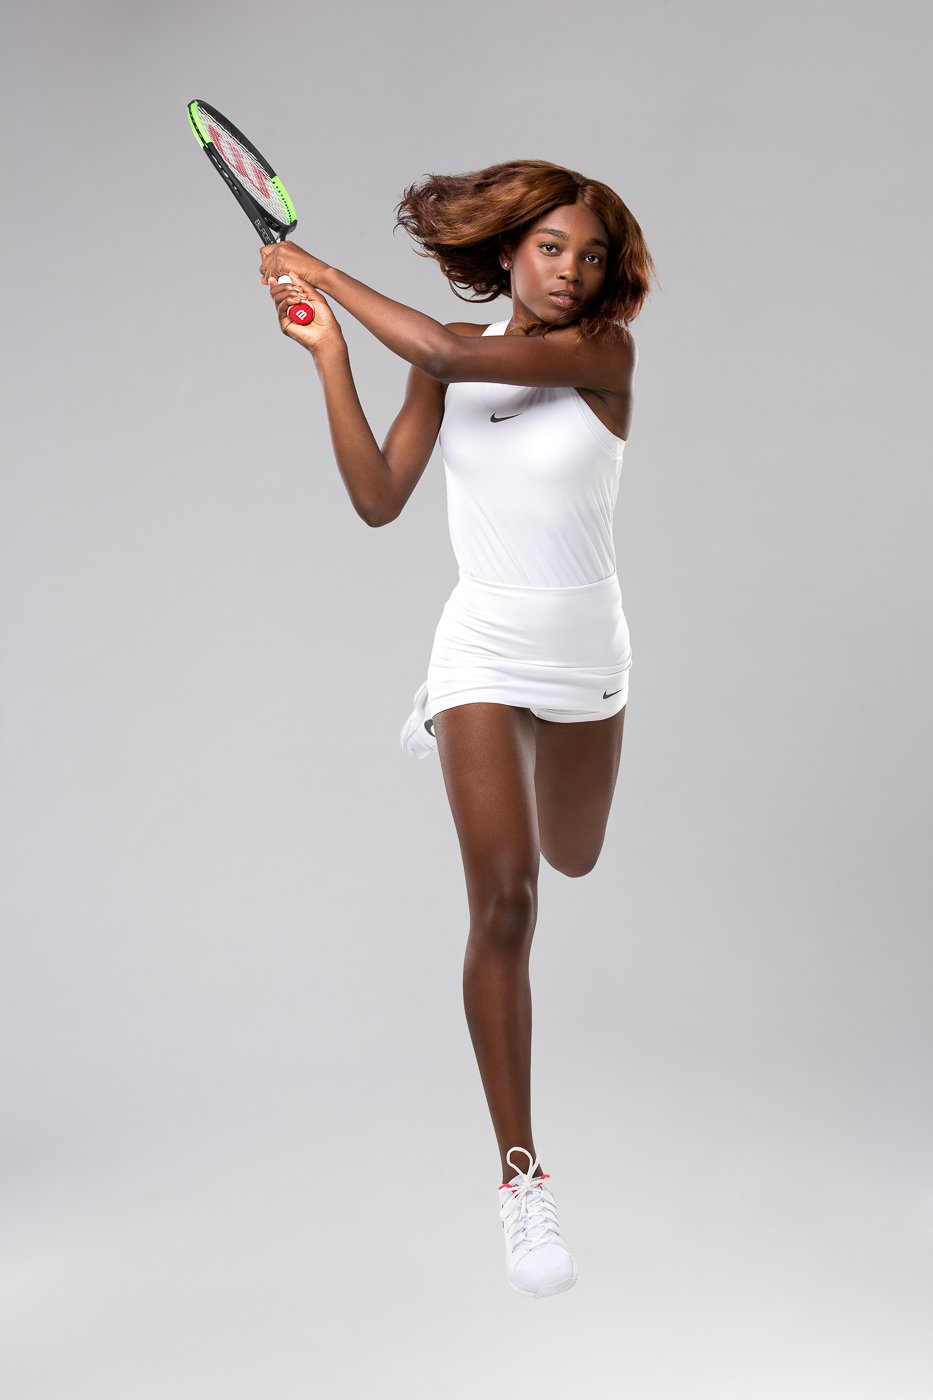 Portrait joueuse tennis canada Francoise Abanda